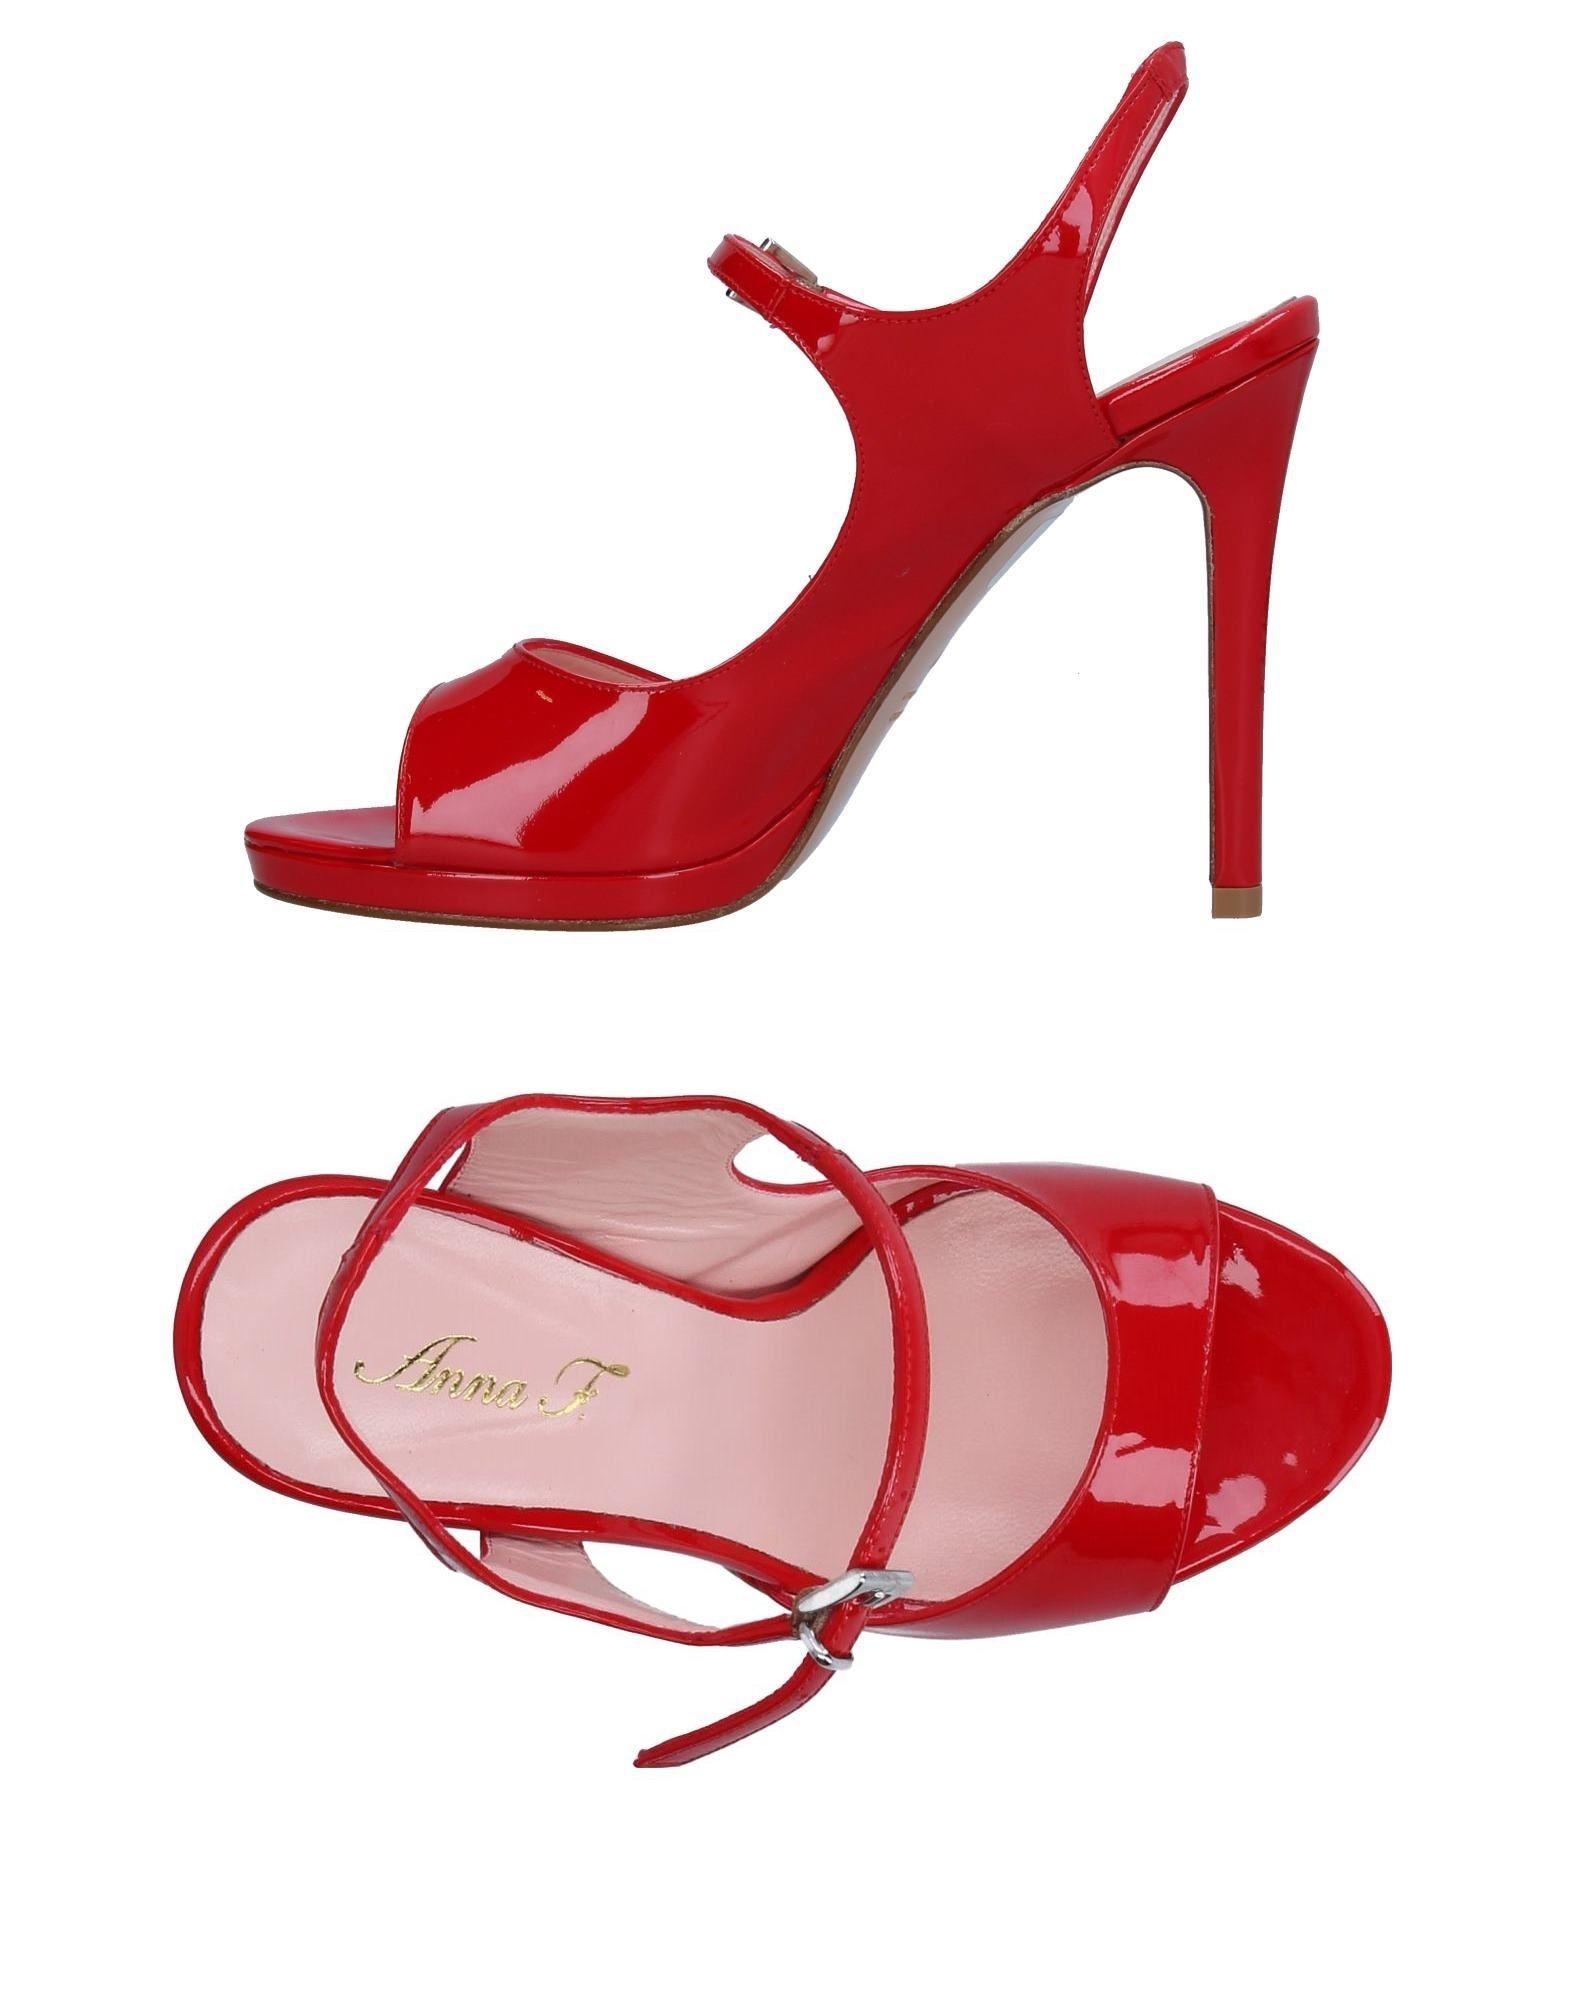 Anna F. Sandalen Damen  11359642SP Gute Qualität beliebte Schuhe